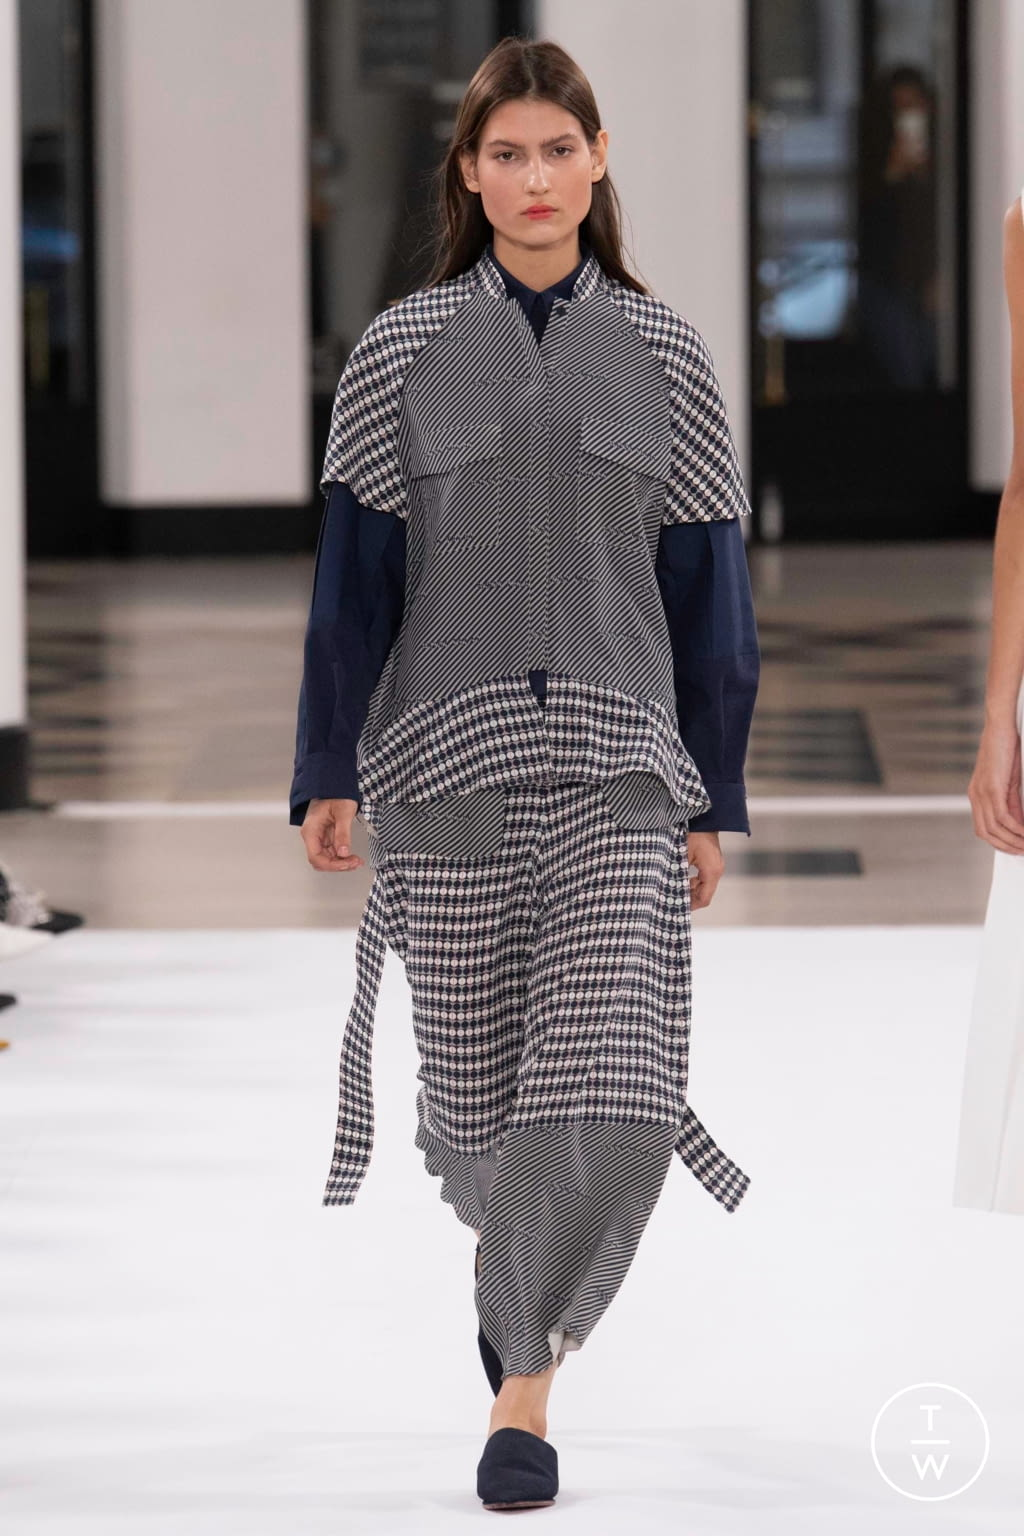 Fashion Week Paris Spring/Summer 2019 look 21 de la collection Nobi Talai womenswear